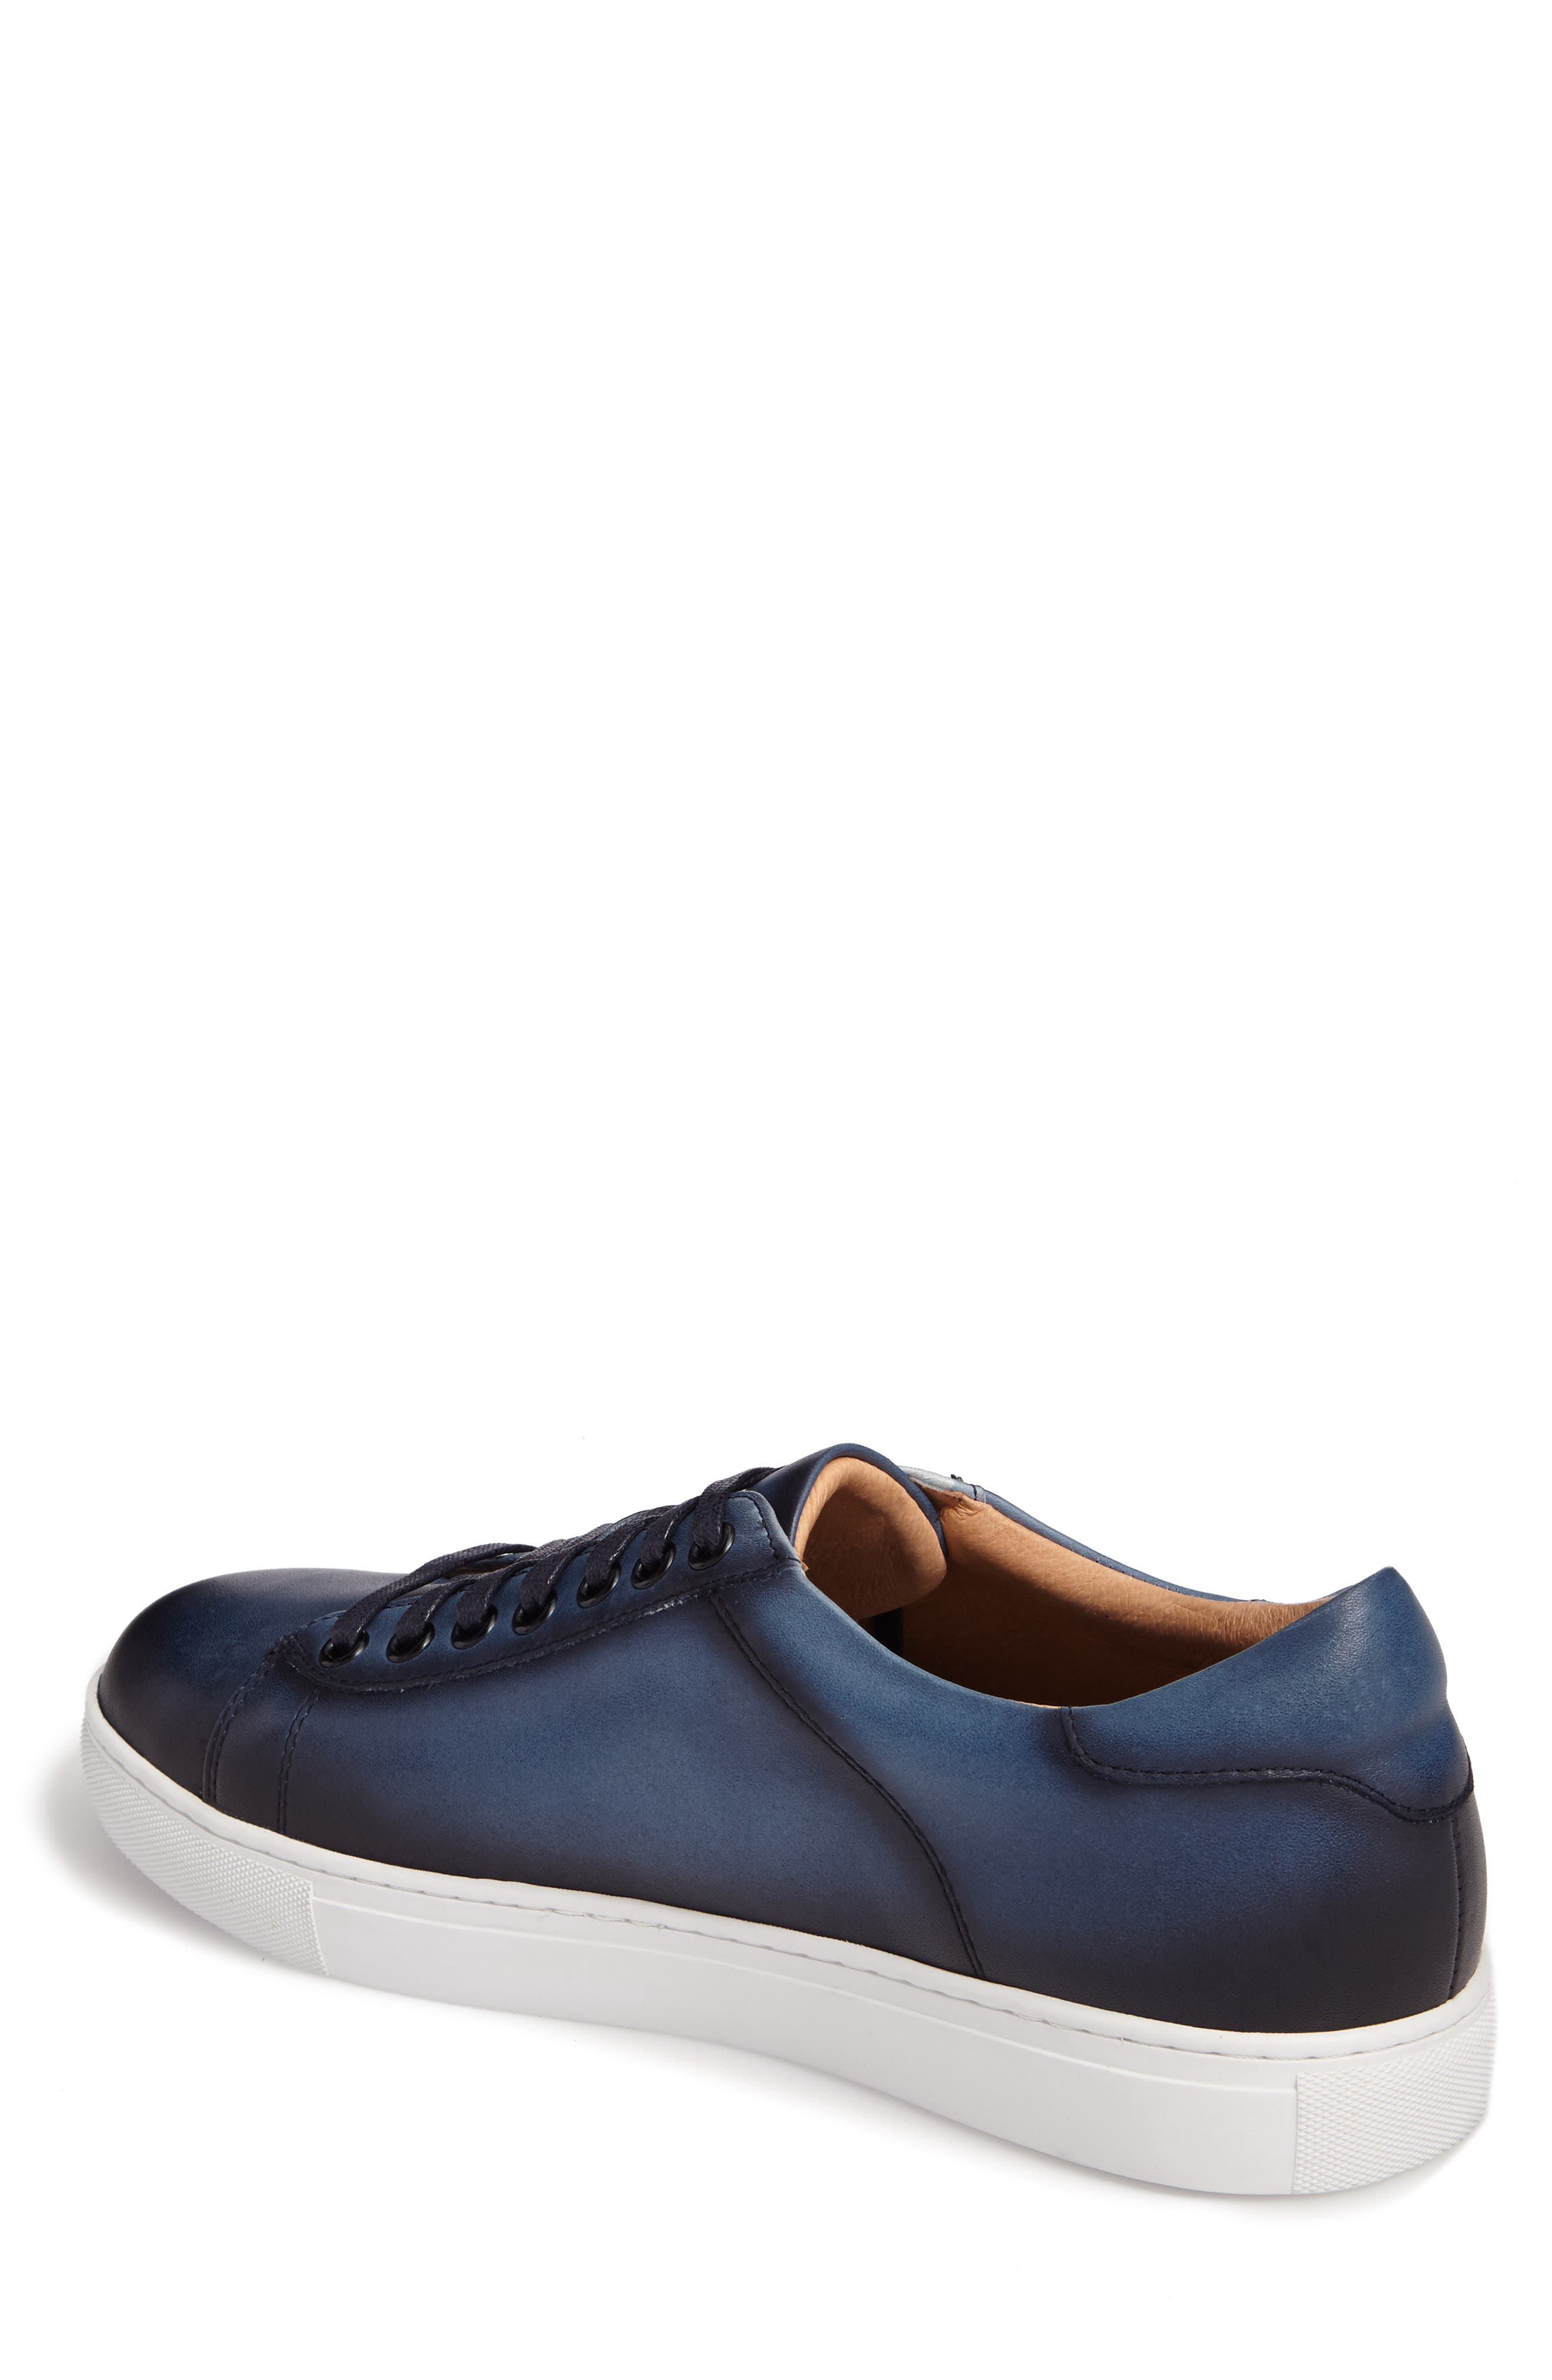 Penrose Sneaker,                             Alternate thumbnail 2, color,                             Blue Leather